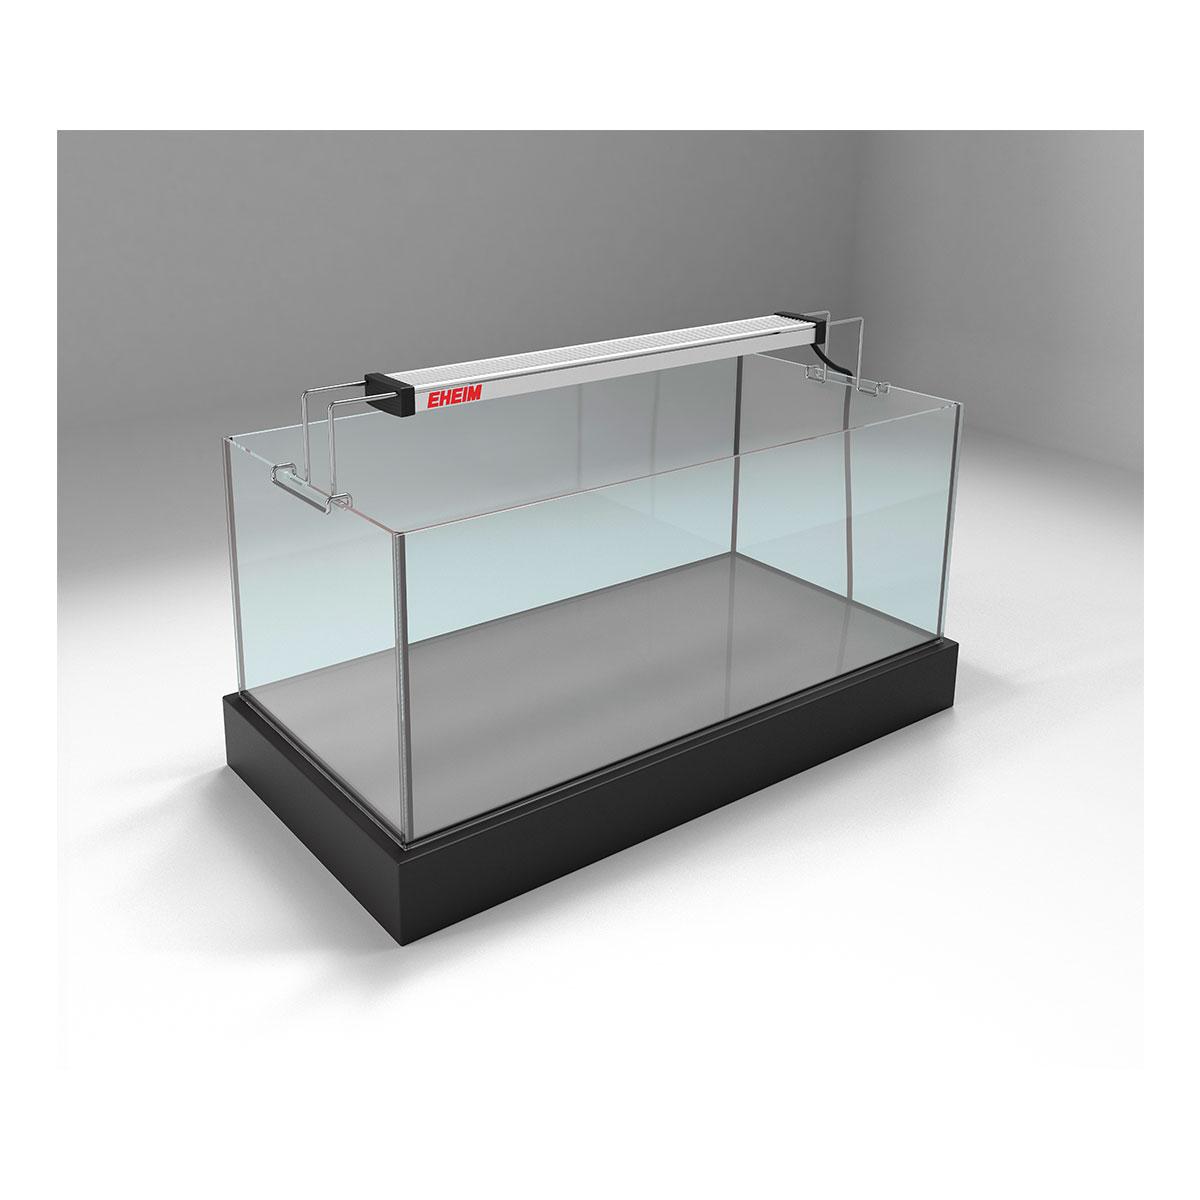 eheim b gelbefestigung f r powerled g nstig kaufen bei zooroyal. Black Bedroom Furniture Sets. Home Design Ideas